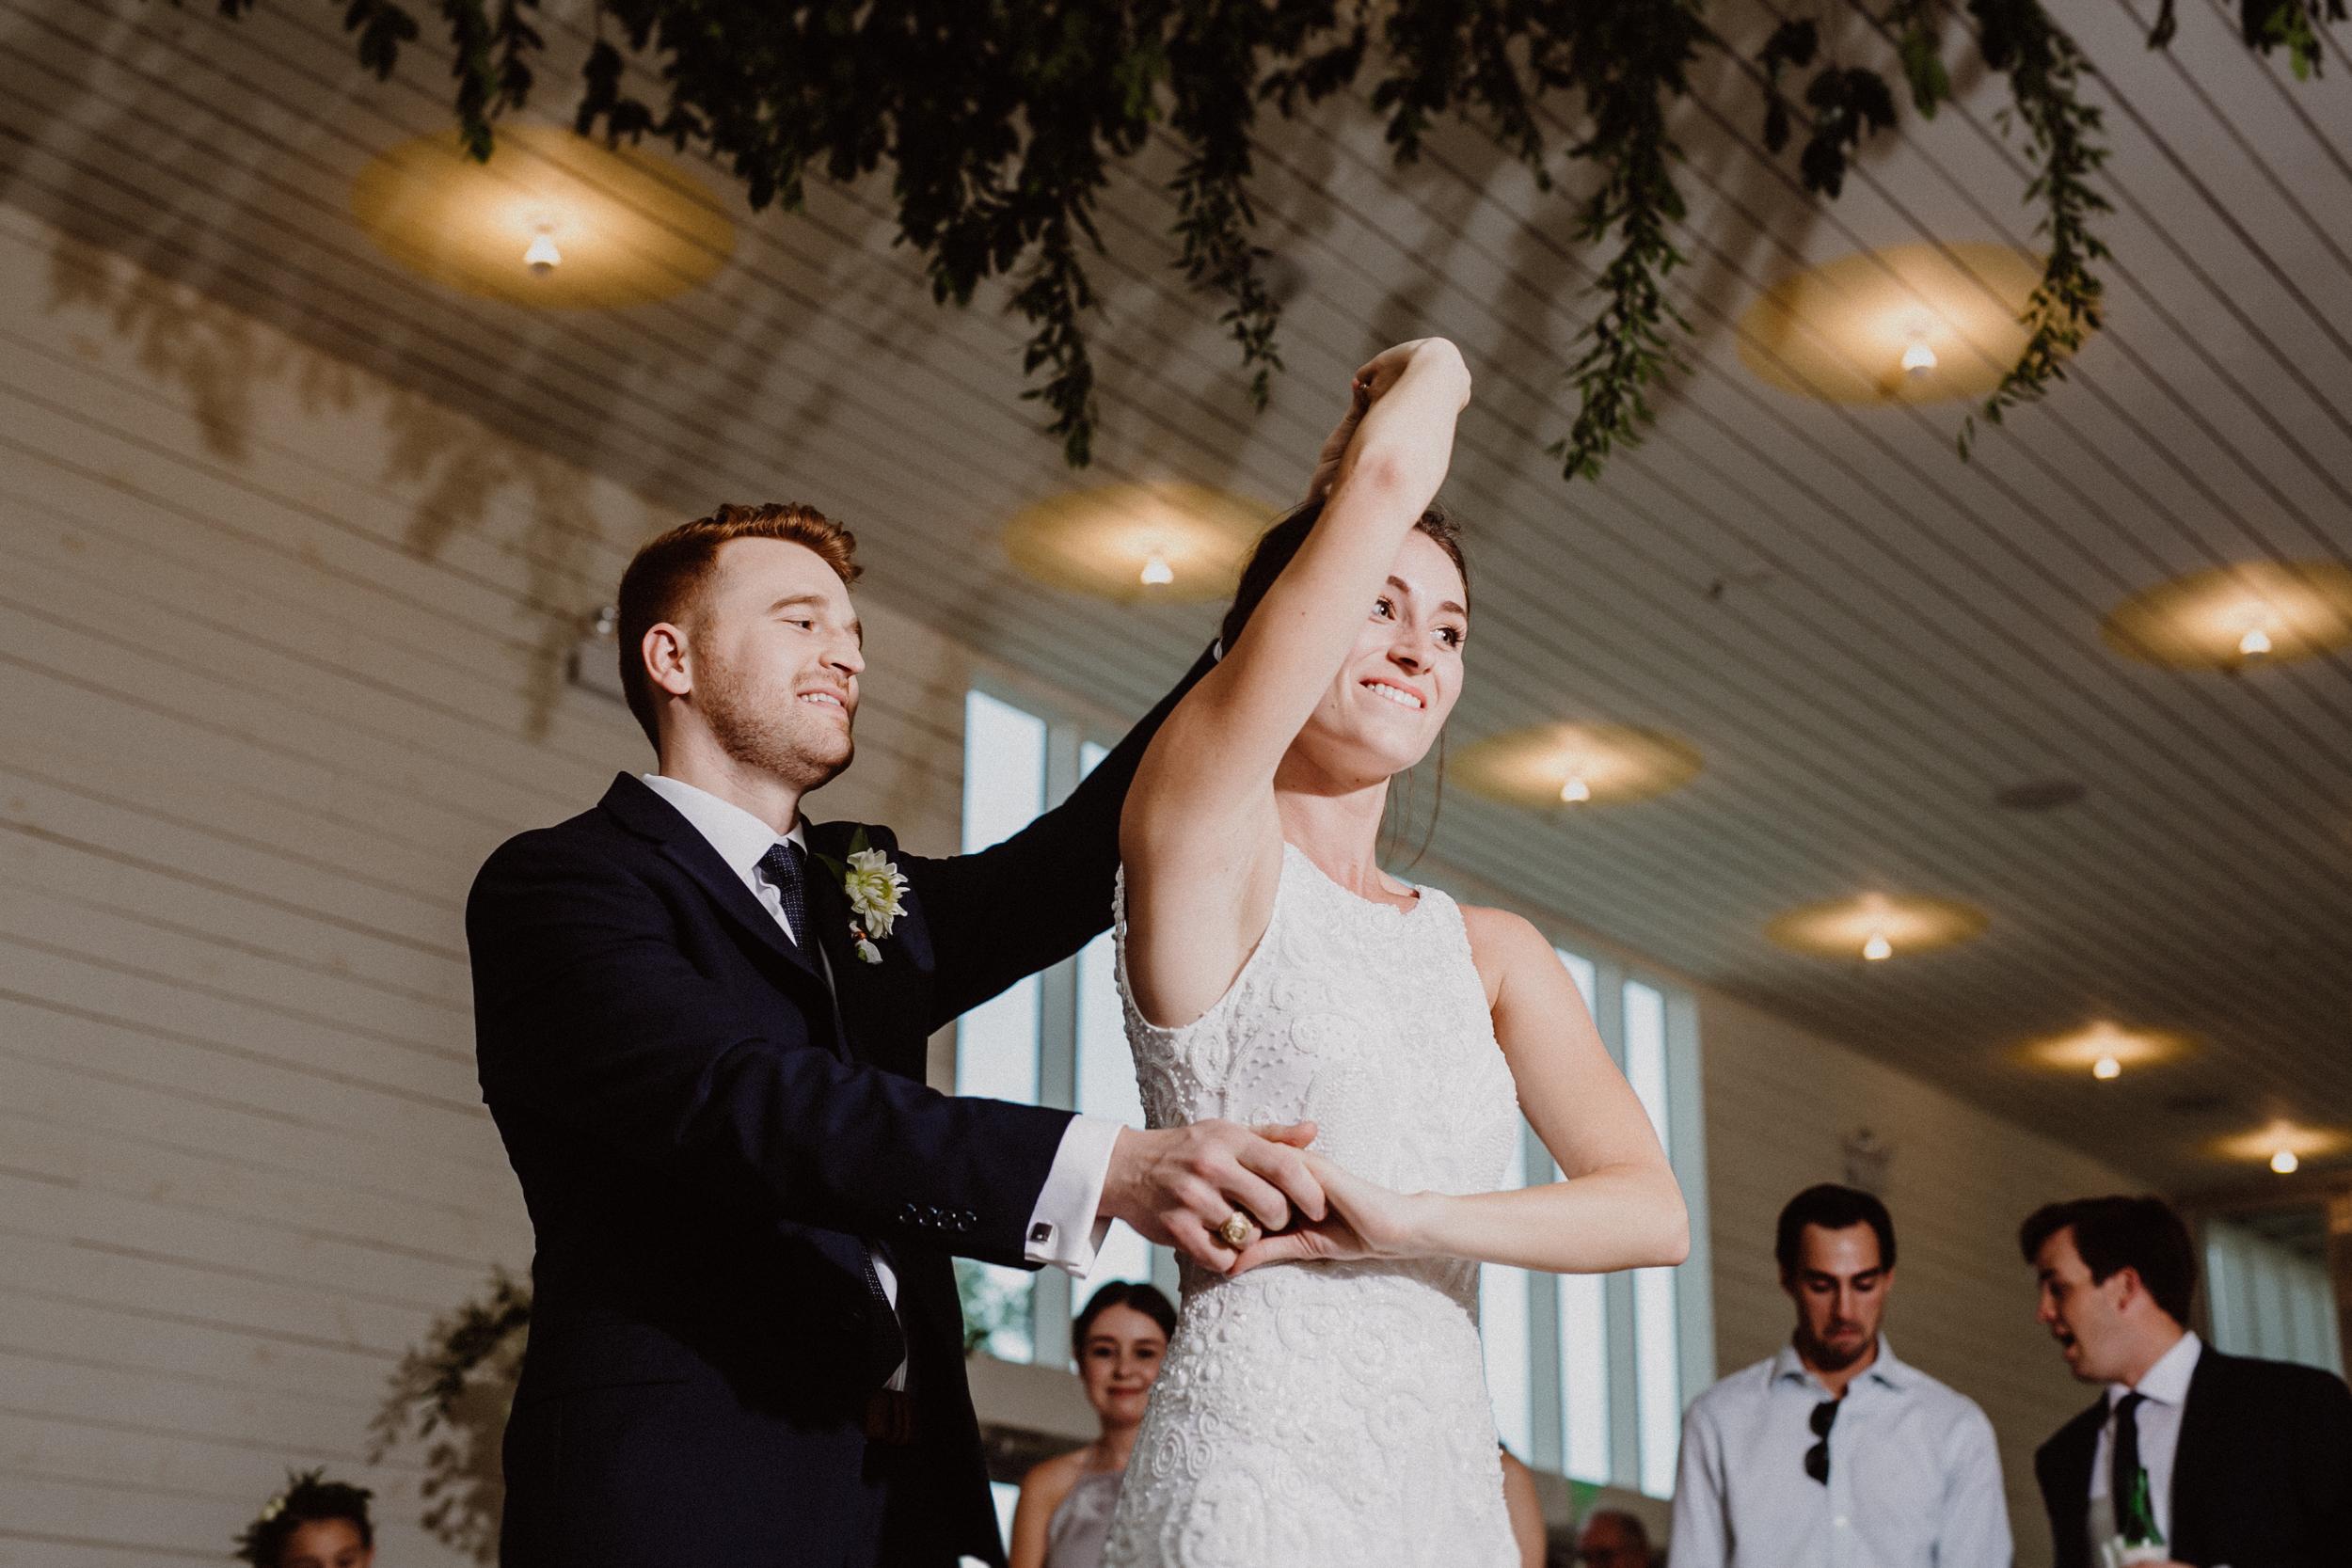 prospect-house-wedding-S&AC-822.jpg